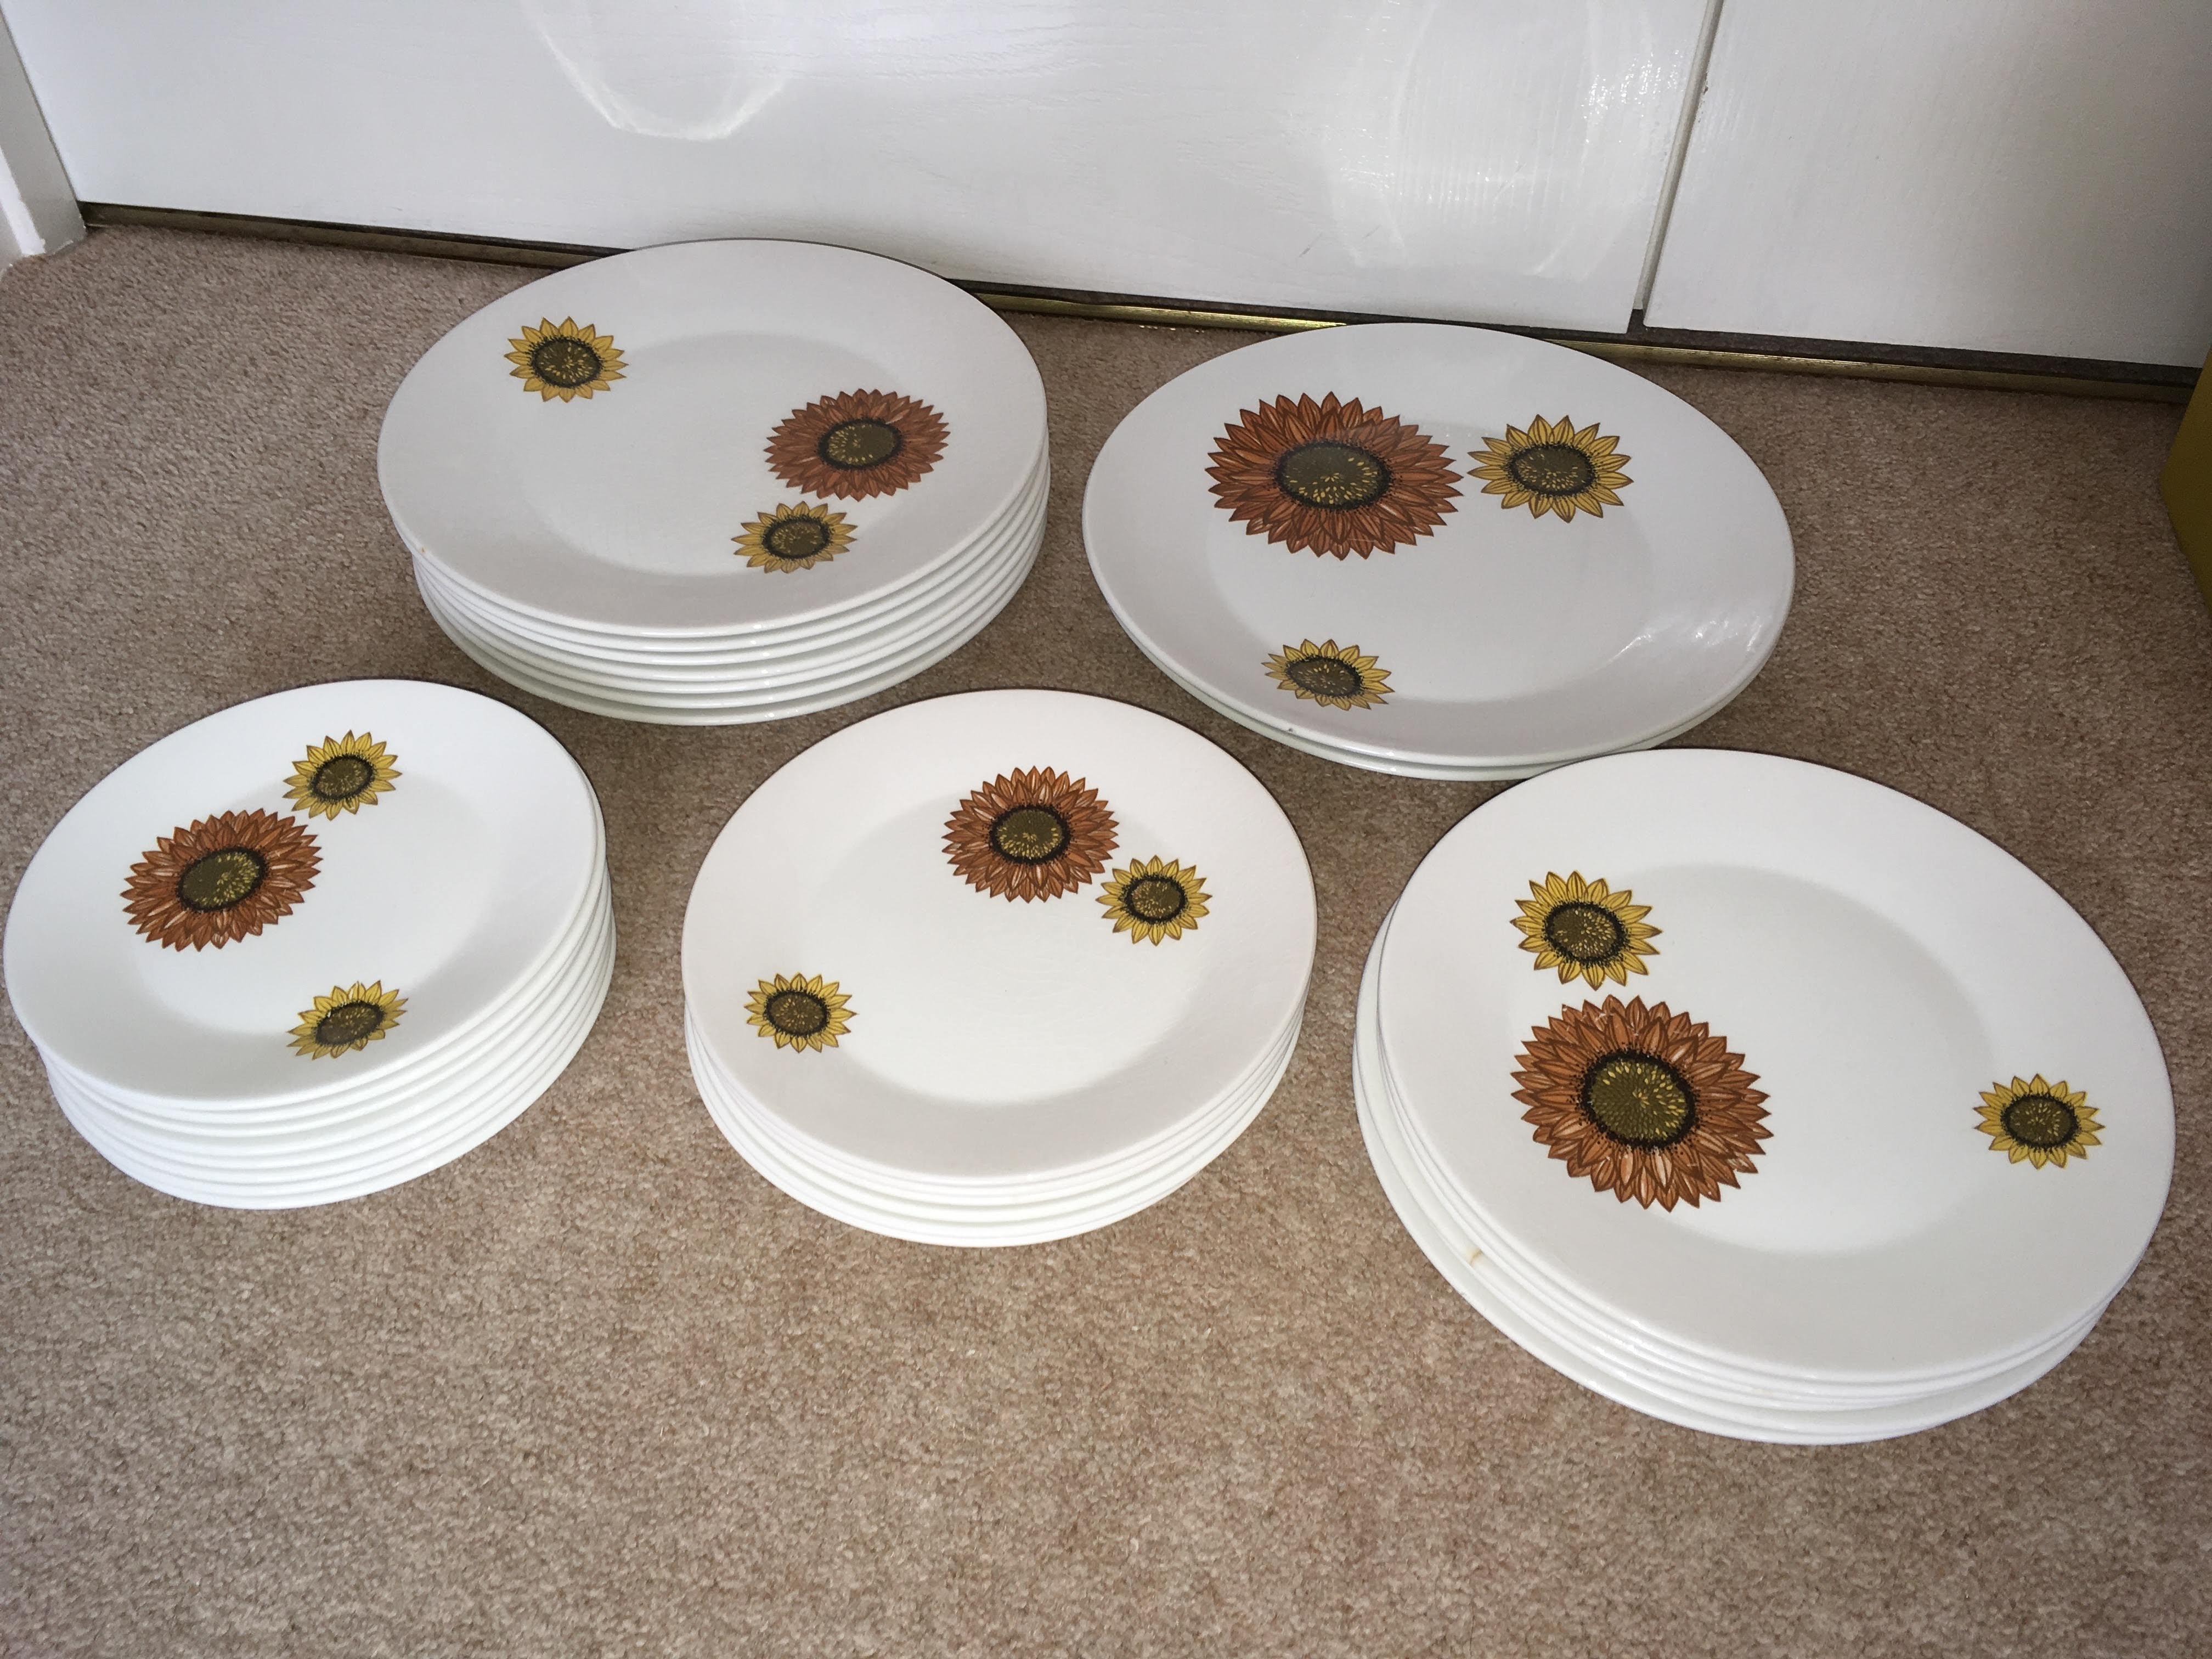 Dinner, side and cake plates (Meakin - Sunflower design)